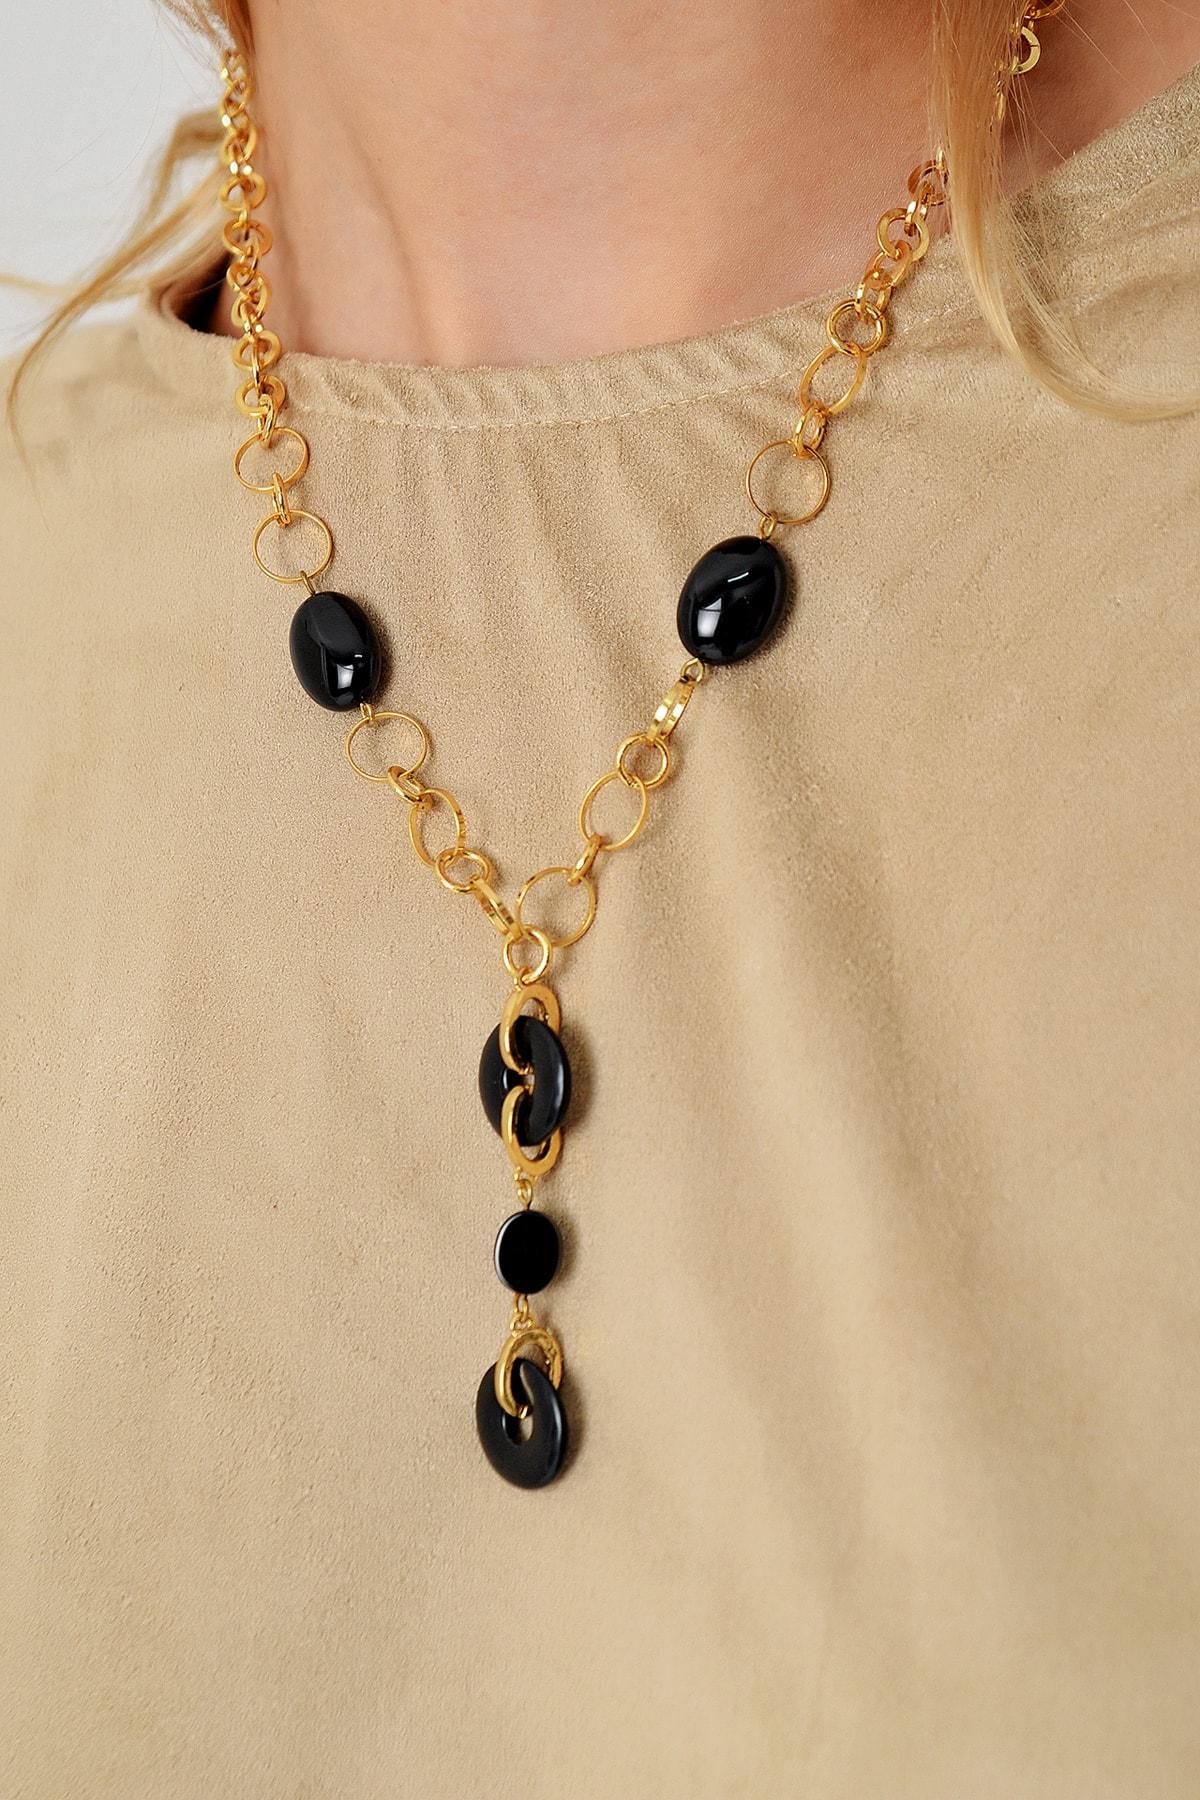 Trend Alaçatı Stili Kadın Gold Damla Taşlı Zincir Kolye ALC-A2001 1